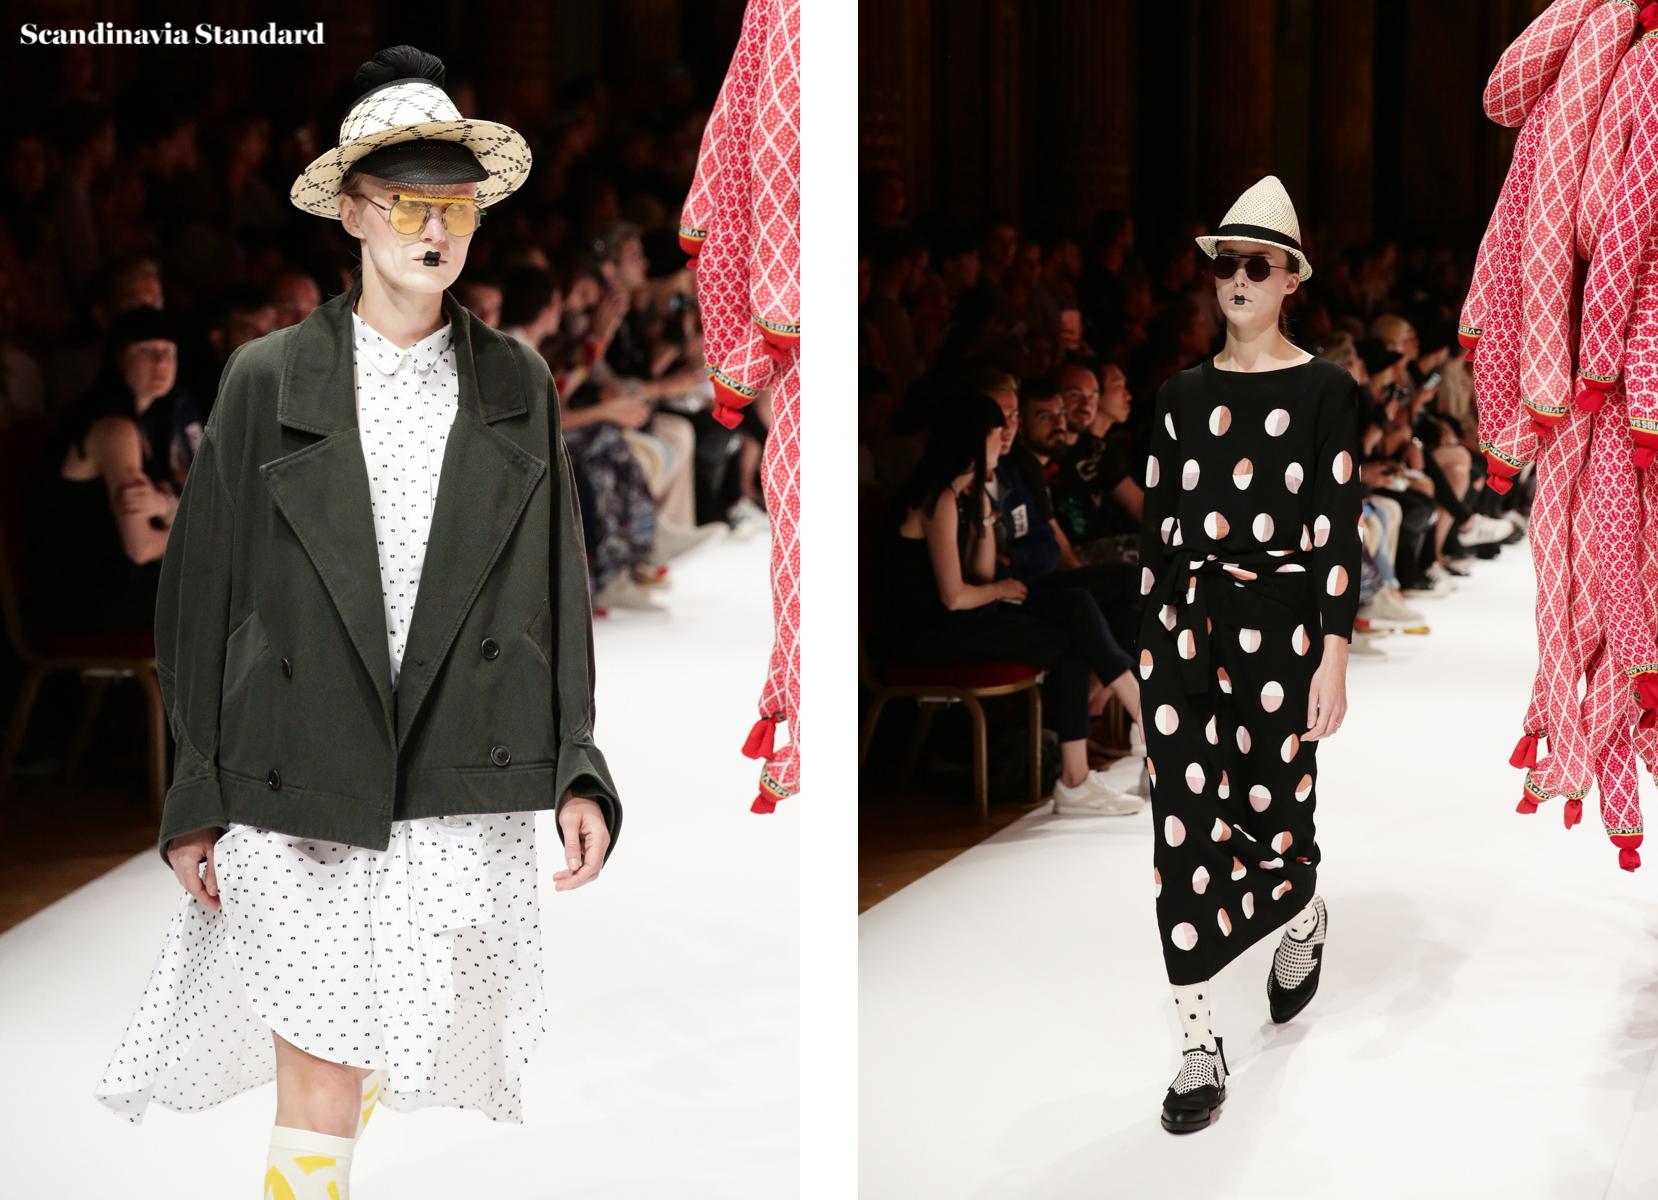 Henrik Vibskov SS17 Paris Fashion Week Men's - J56B6322-2